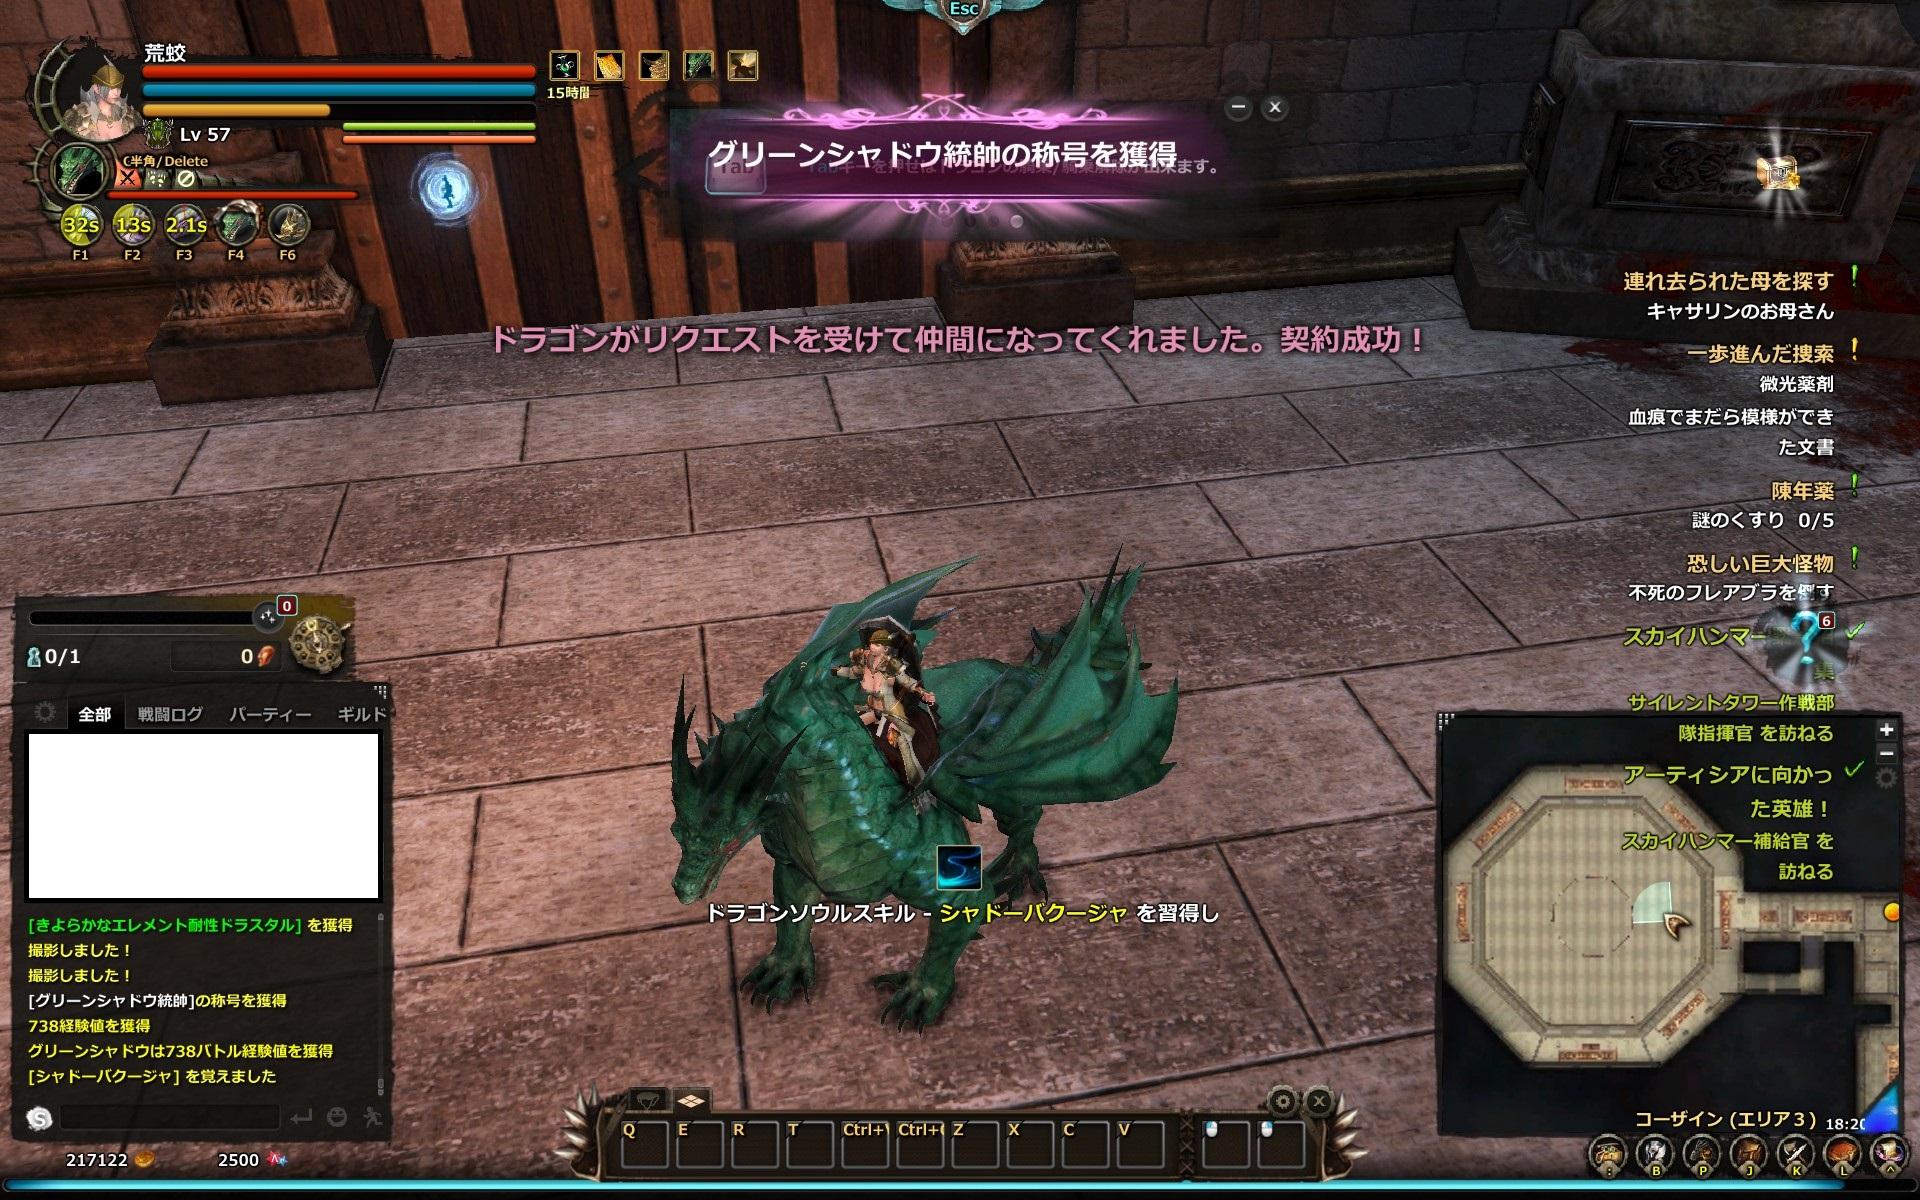 DragonsProphet_20150717_182007.jpg